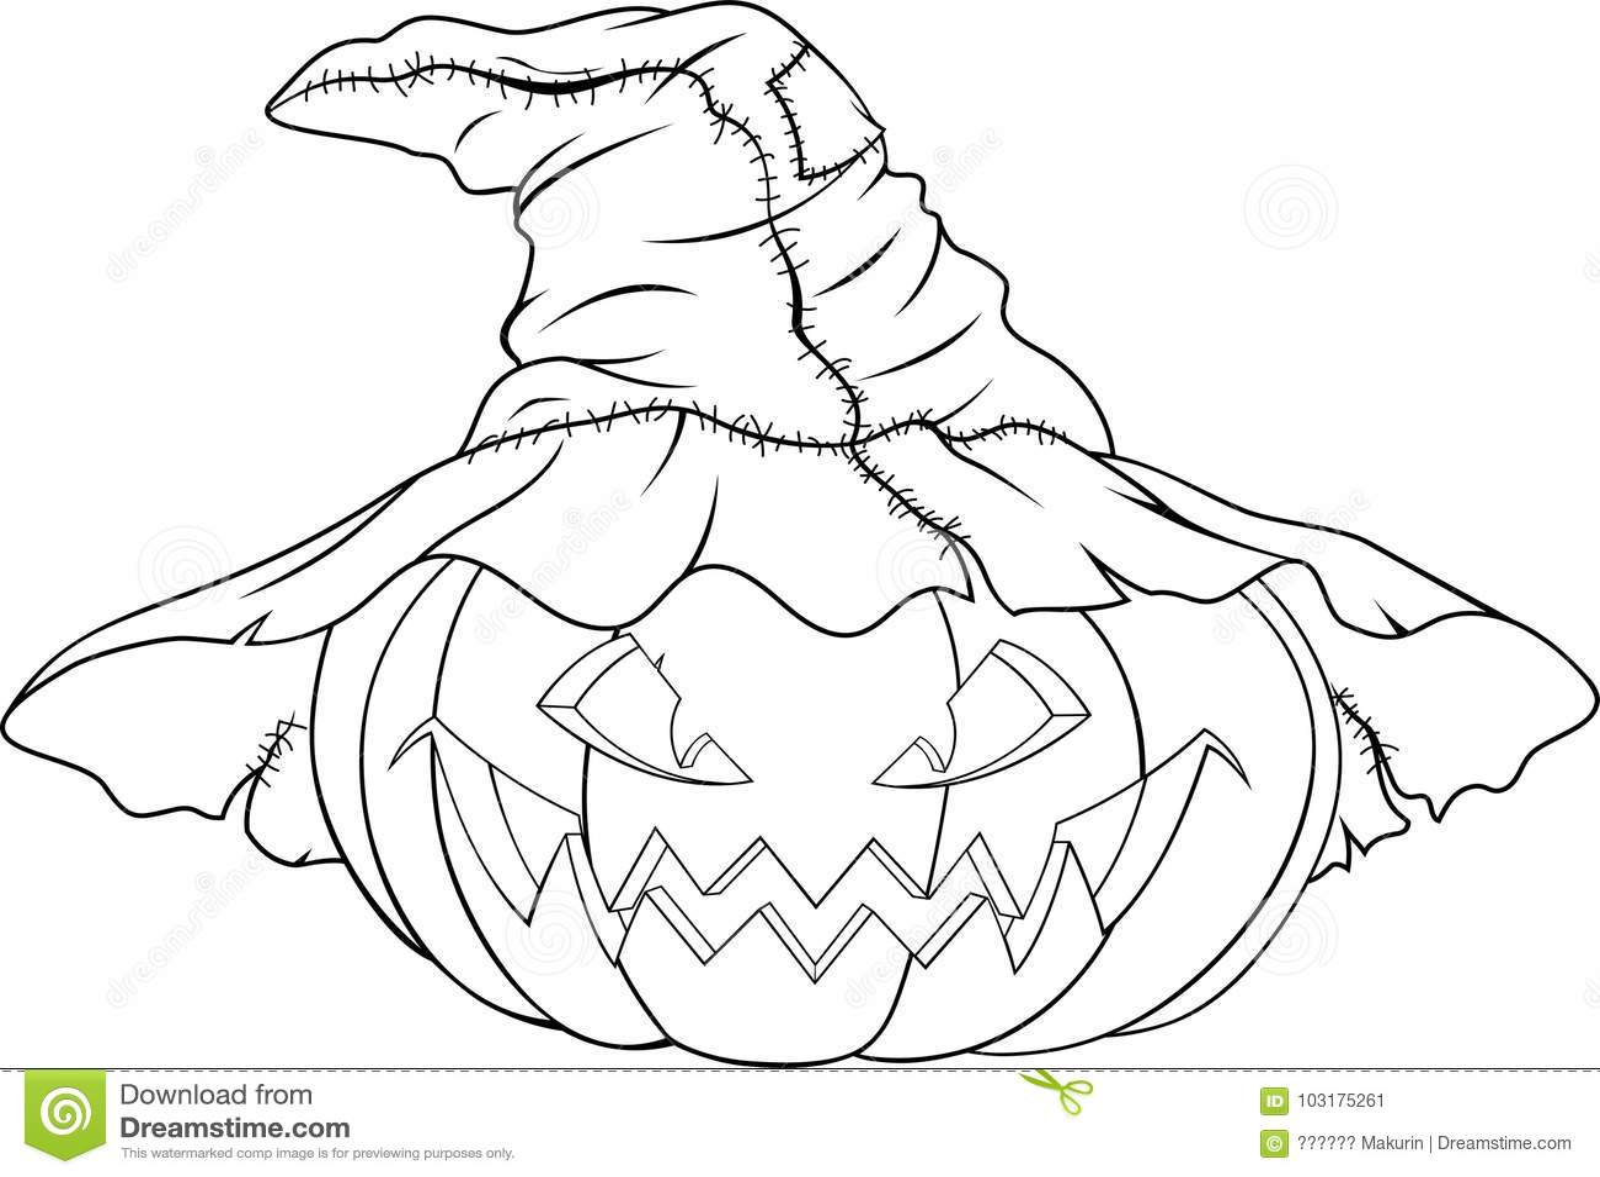 Coloring Pumpkin For Halloweenn Stock Vector - Illustration of draw ...